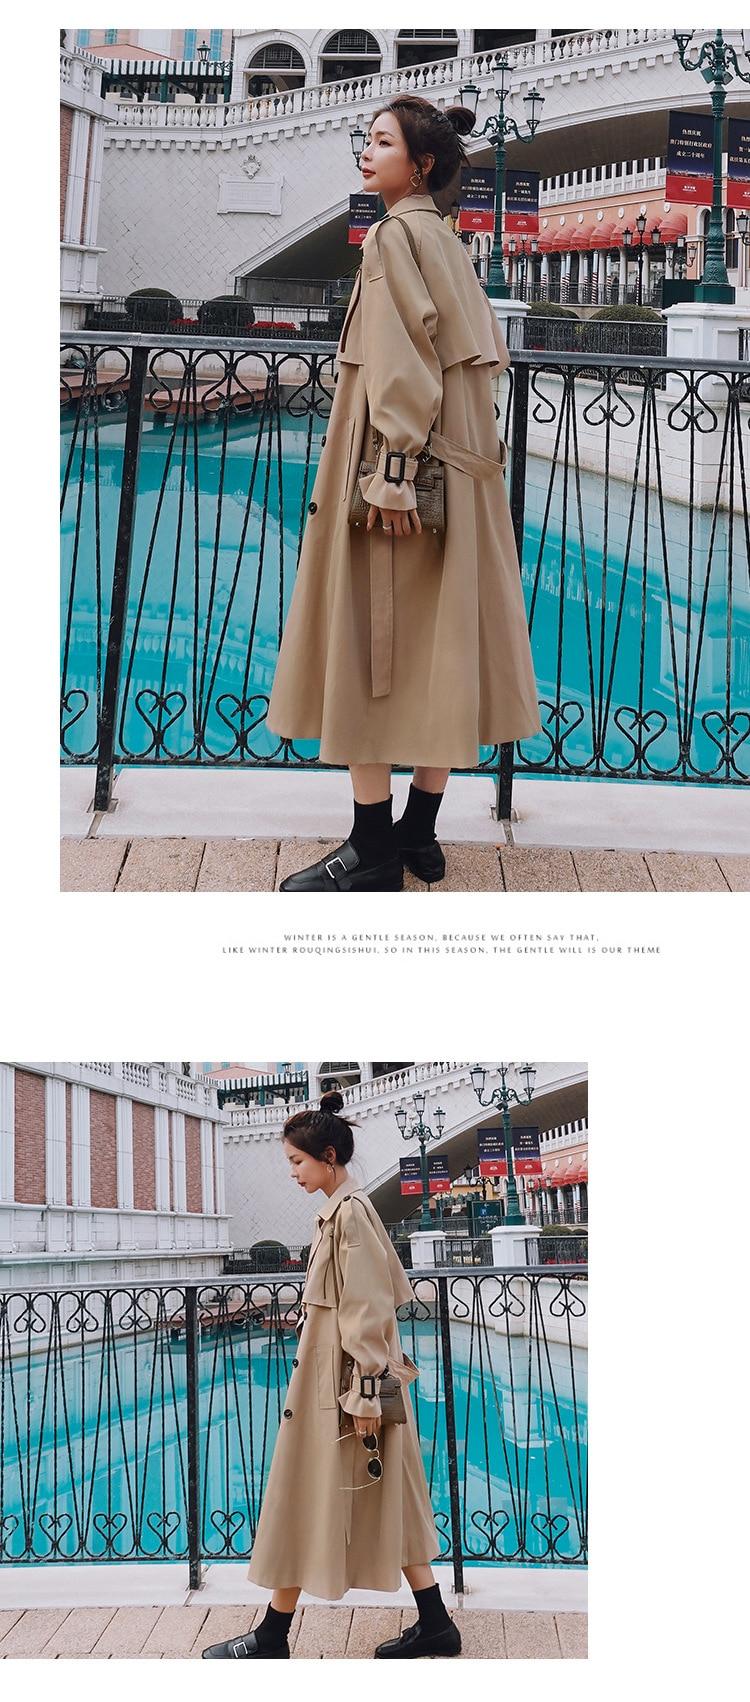 Hc84f0ac33b0e4a61b23d56ea782d3b7eA 2021 Autumn Women Trench Coat With Belt Women Clothes Blue Coat Casaco Feminino Harajuku Abrigo Mujer Long Trench Femme